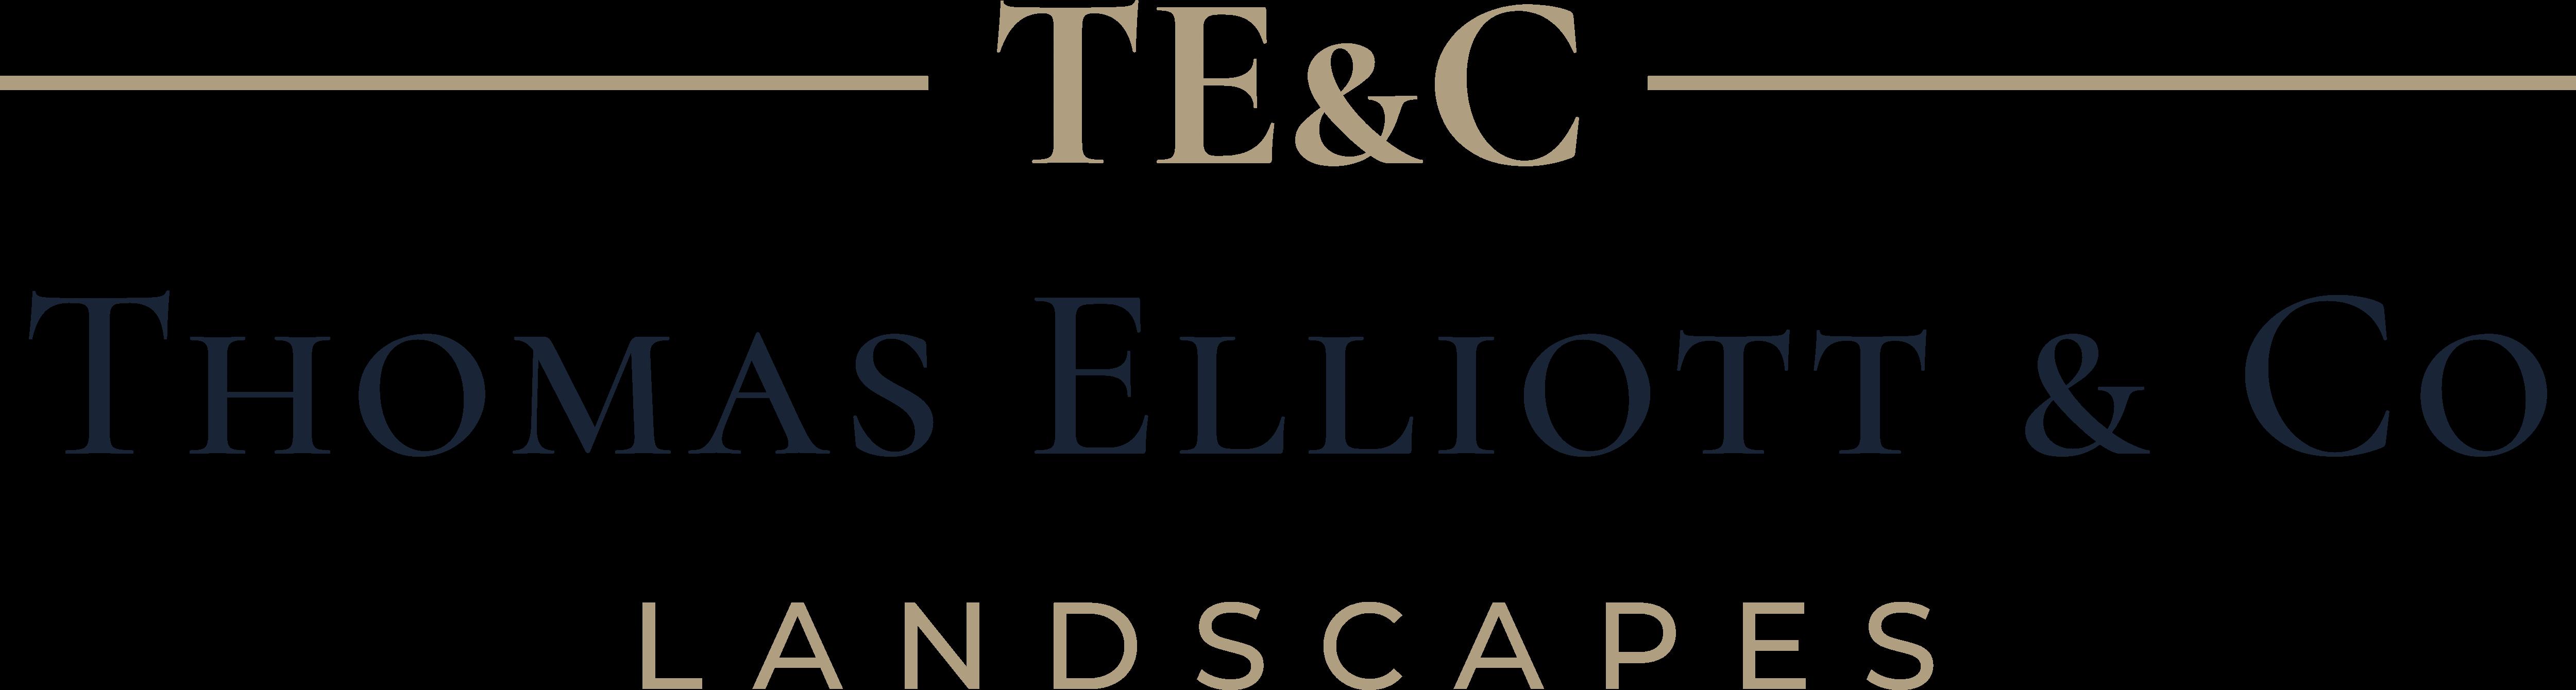 Thomas Elliott & Co